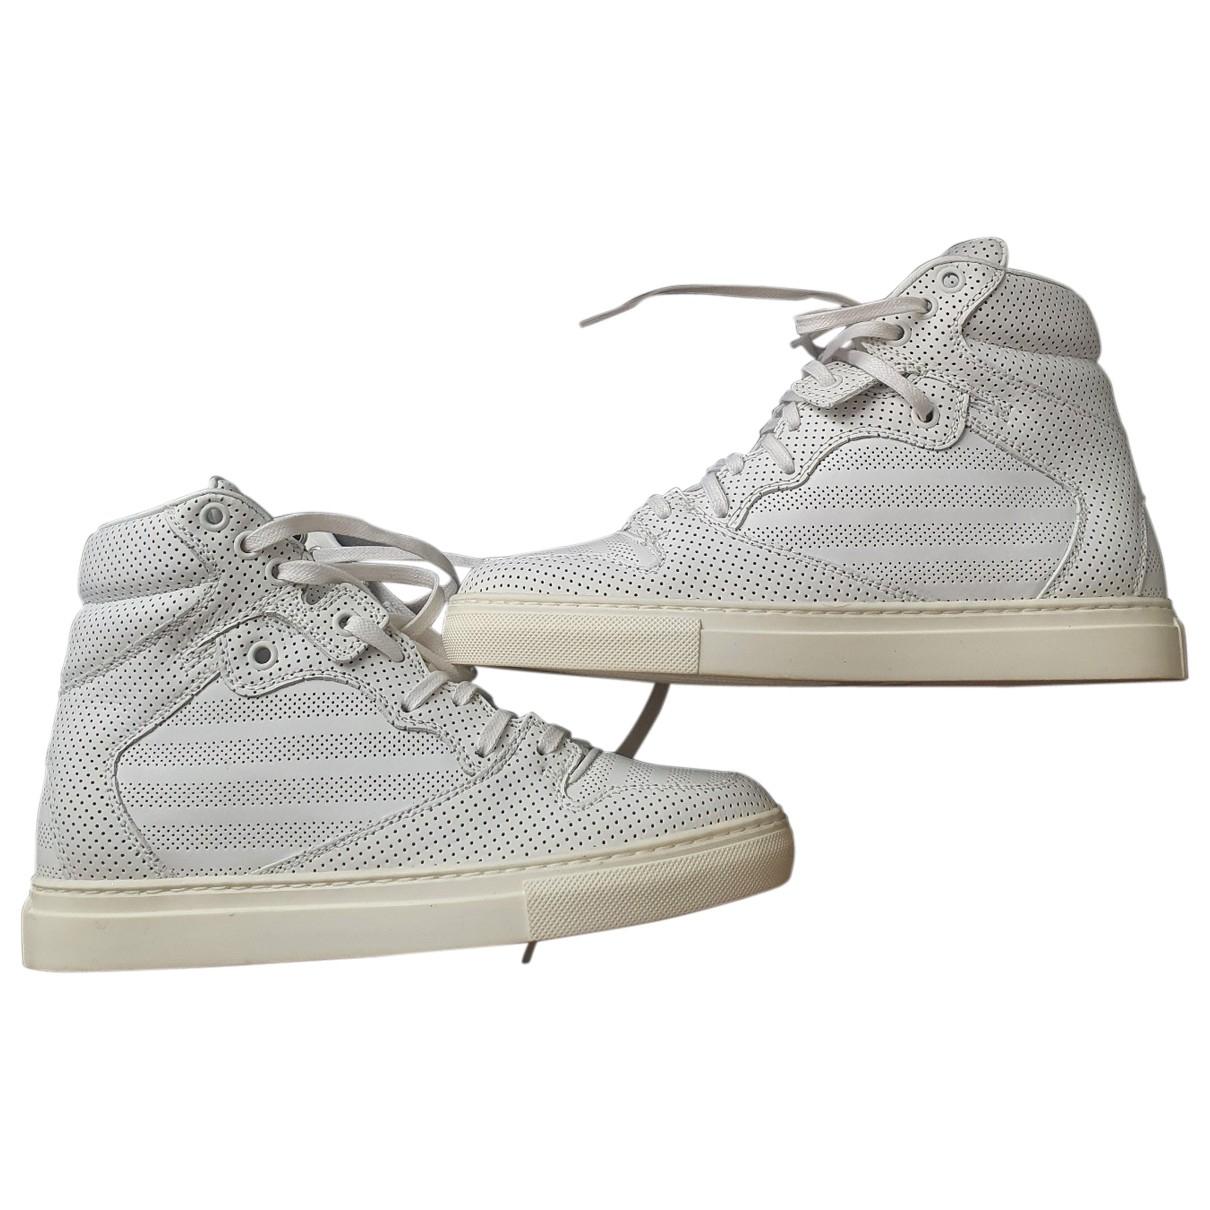 Balenciaga N White Leather Trainers for Women 36 EU